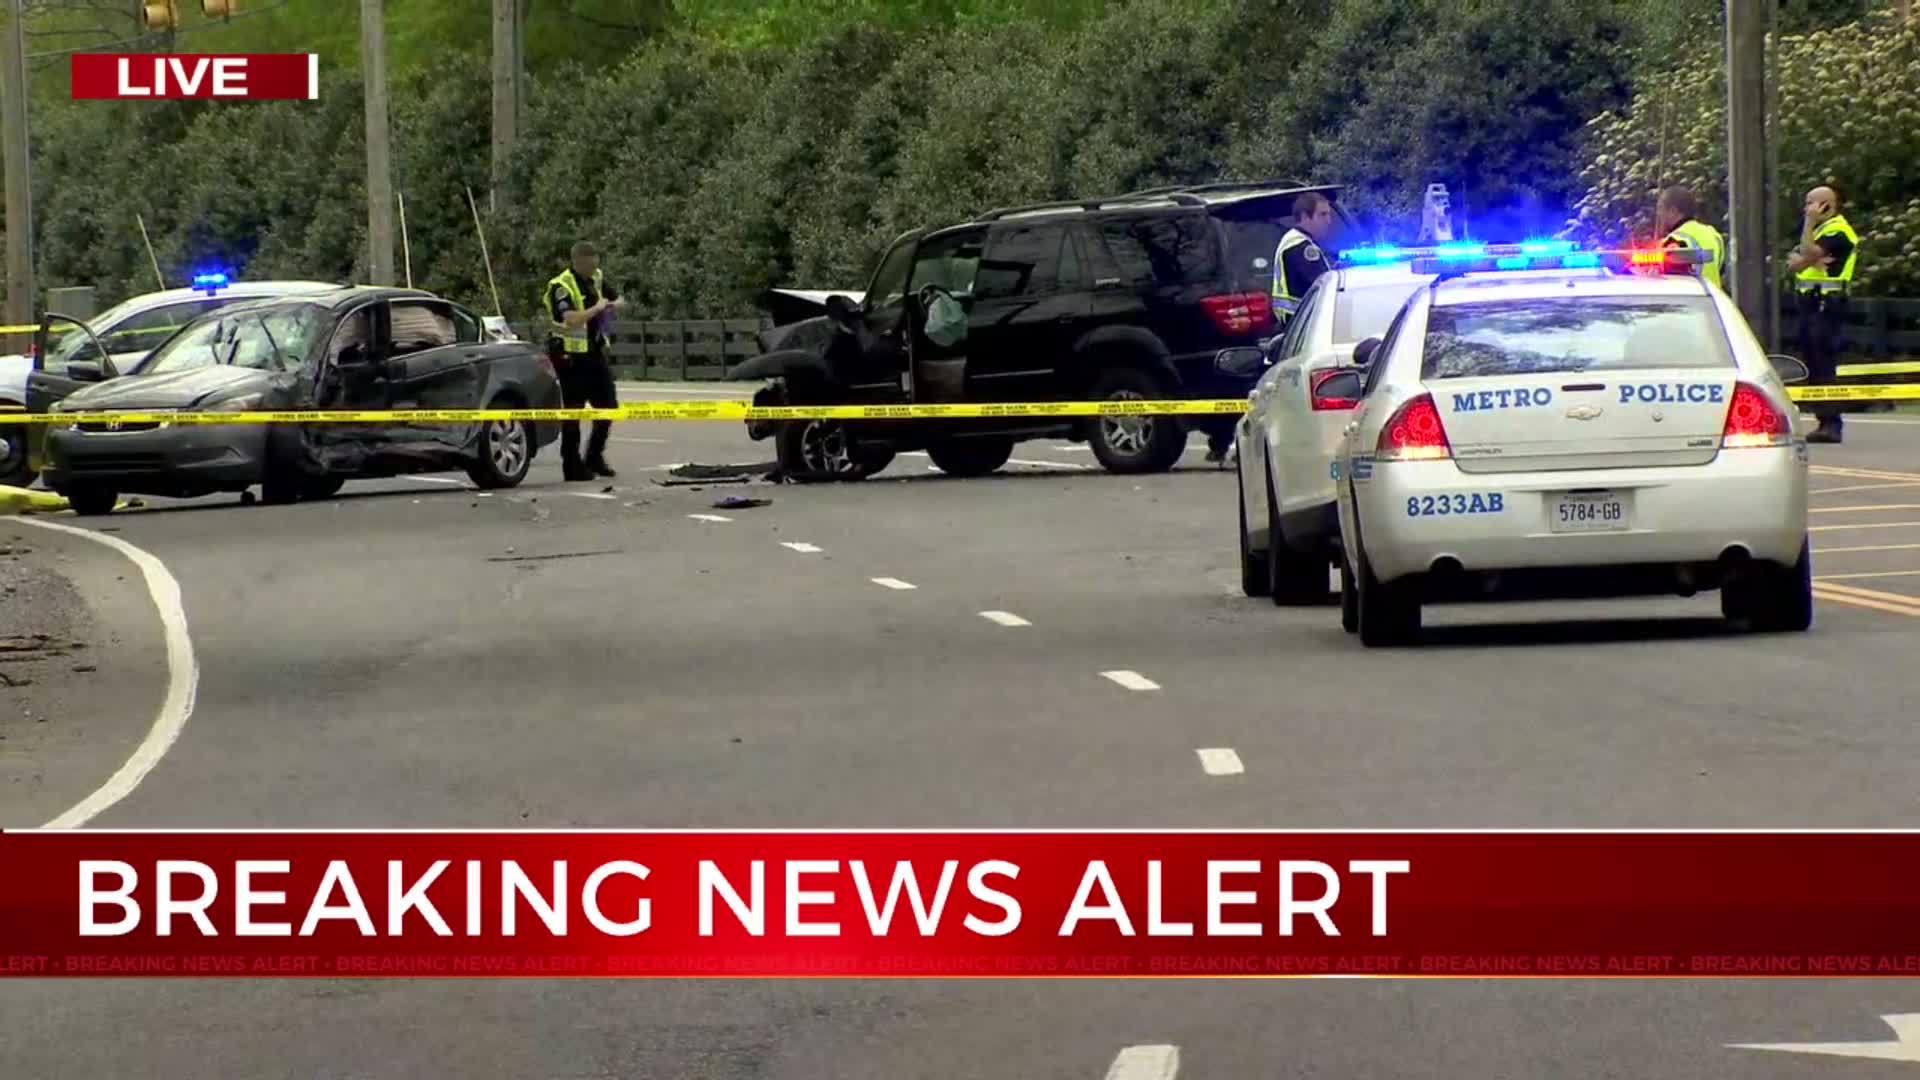 Police identify man killed in crash on Hwy 100 in Bellevue